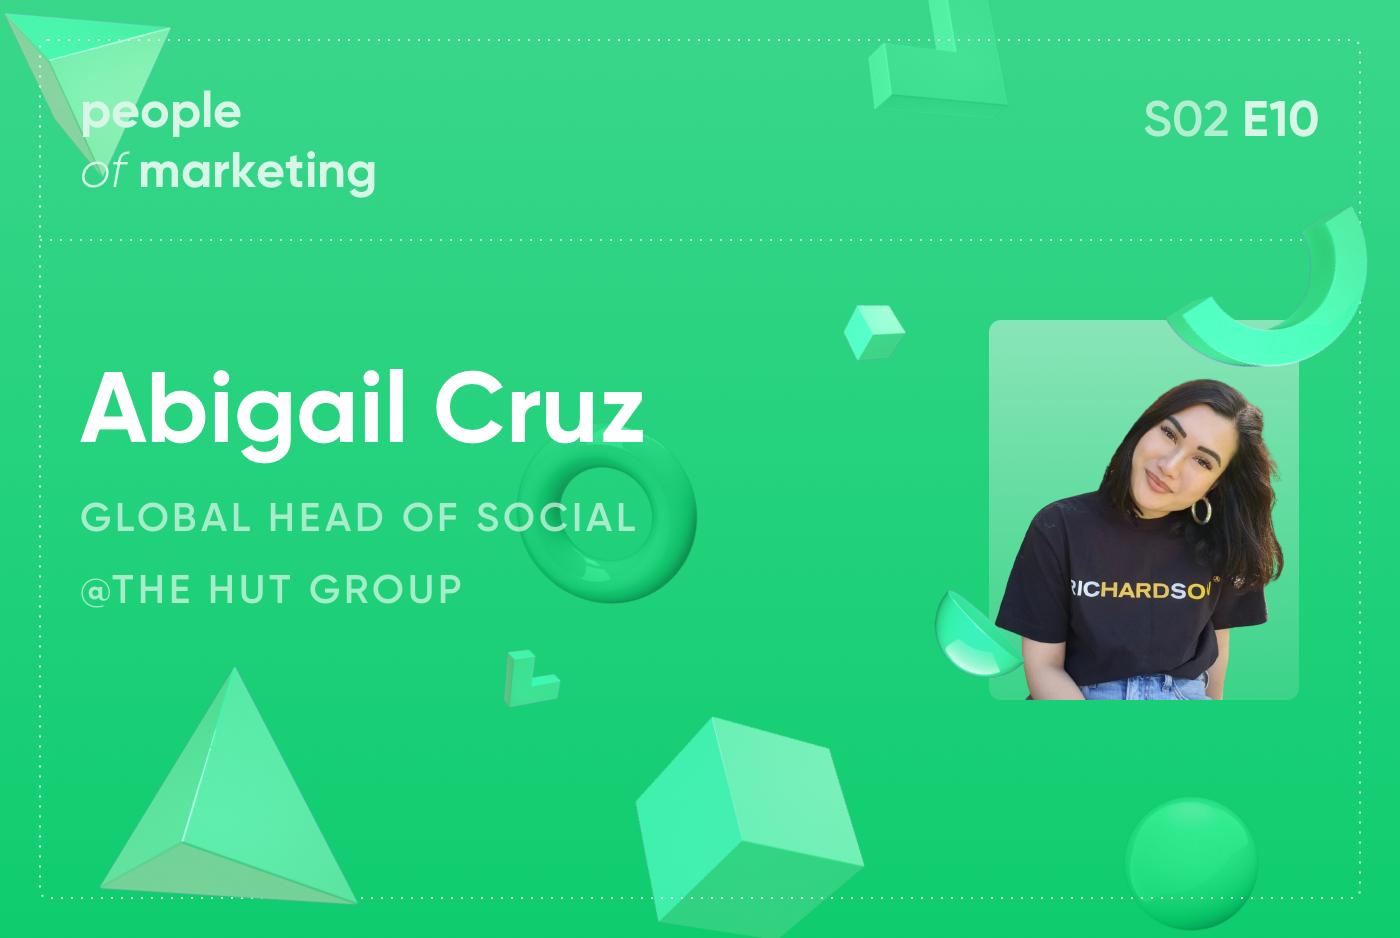 abigail cruz people of marketing